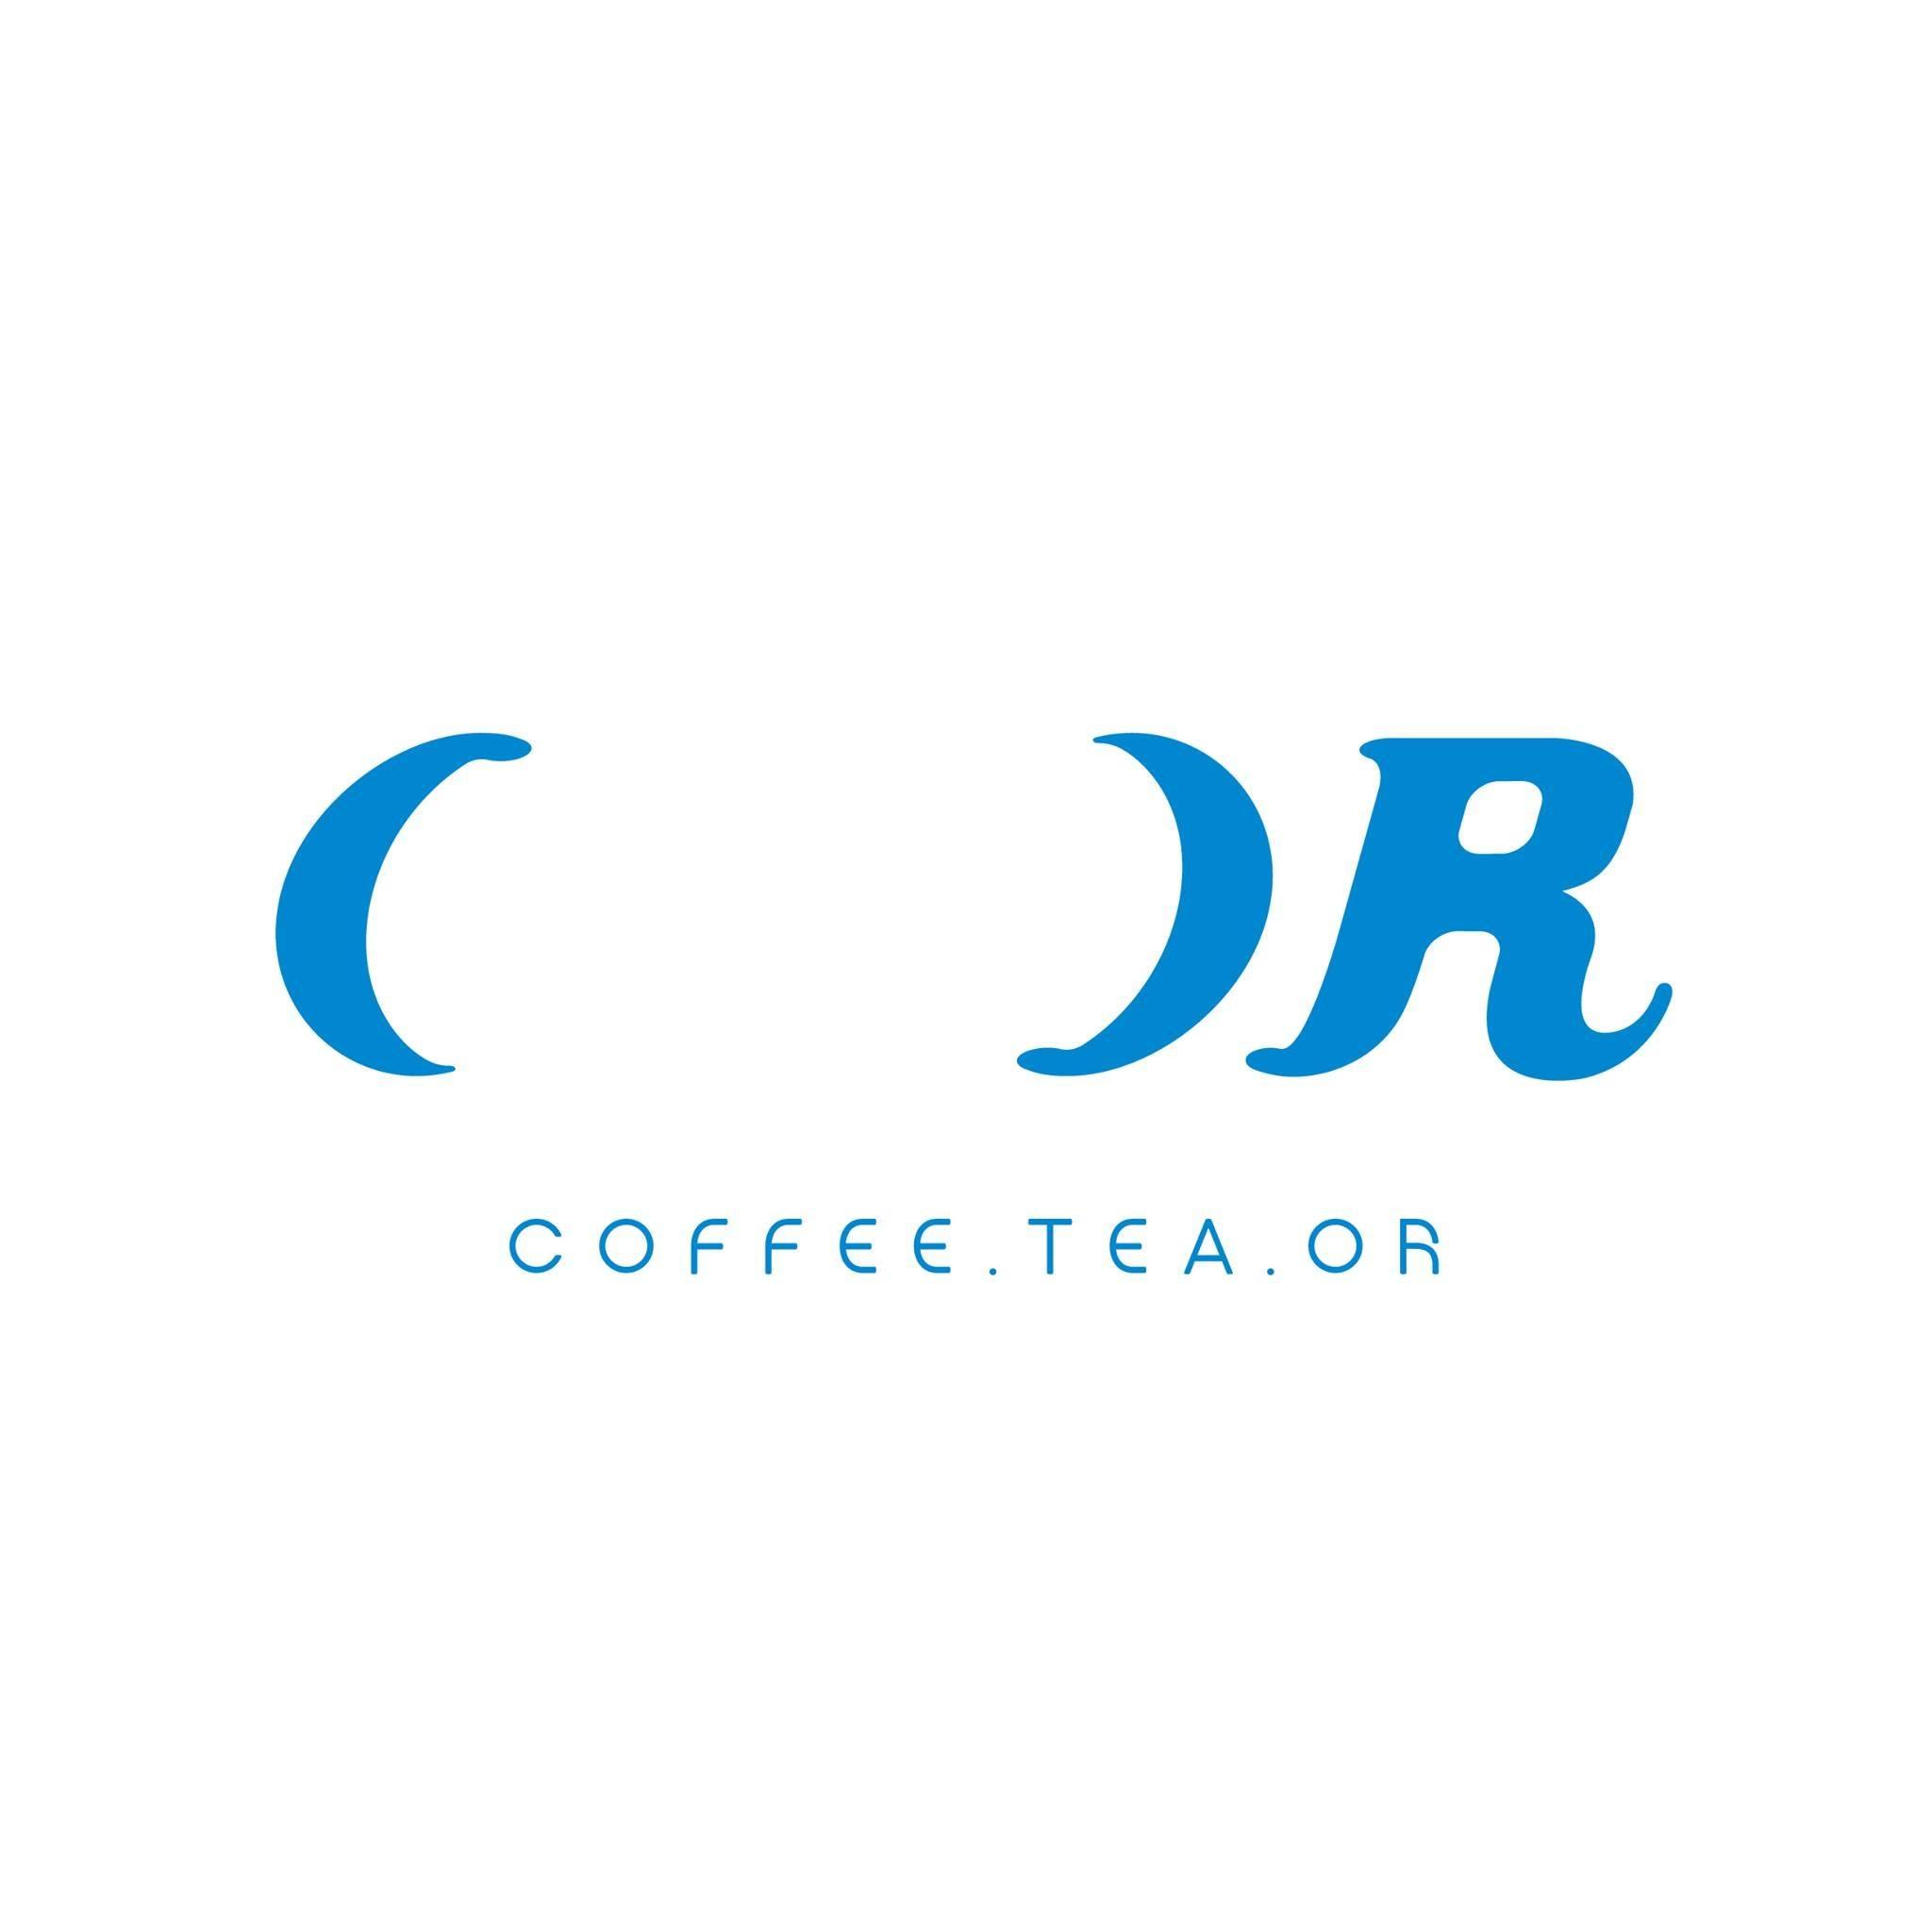 【菜單】Coffee.Tea.Or菜單|2021年價目表|分店據點|Coffee.Tea.Or – 台南正興店